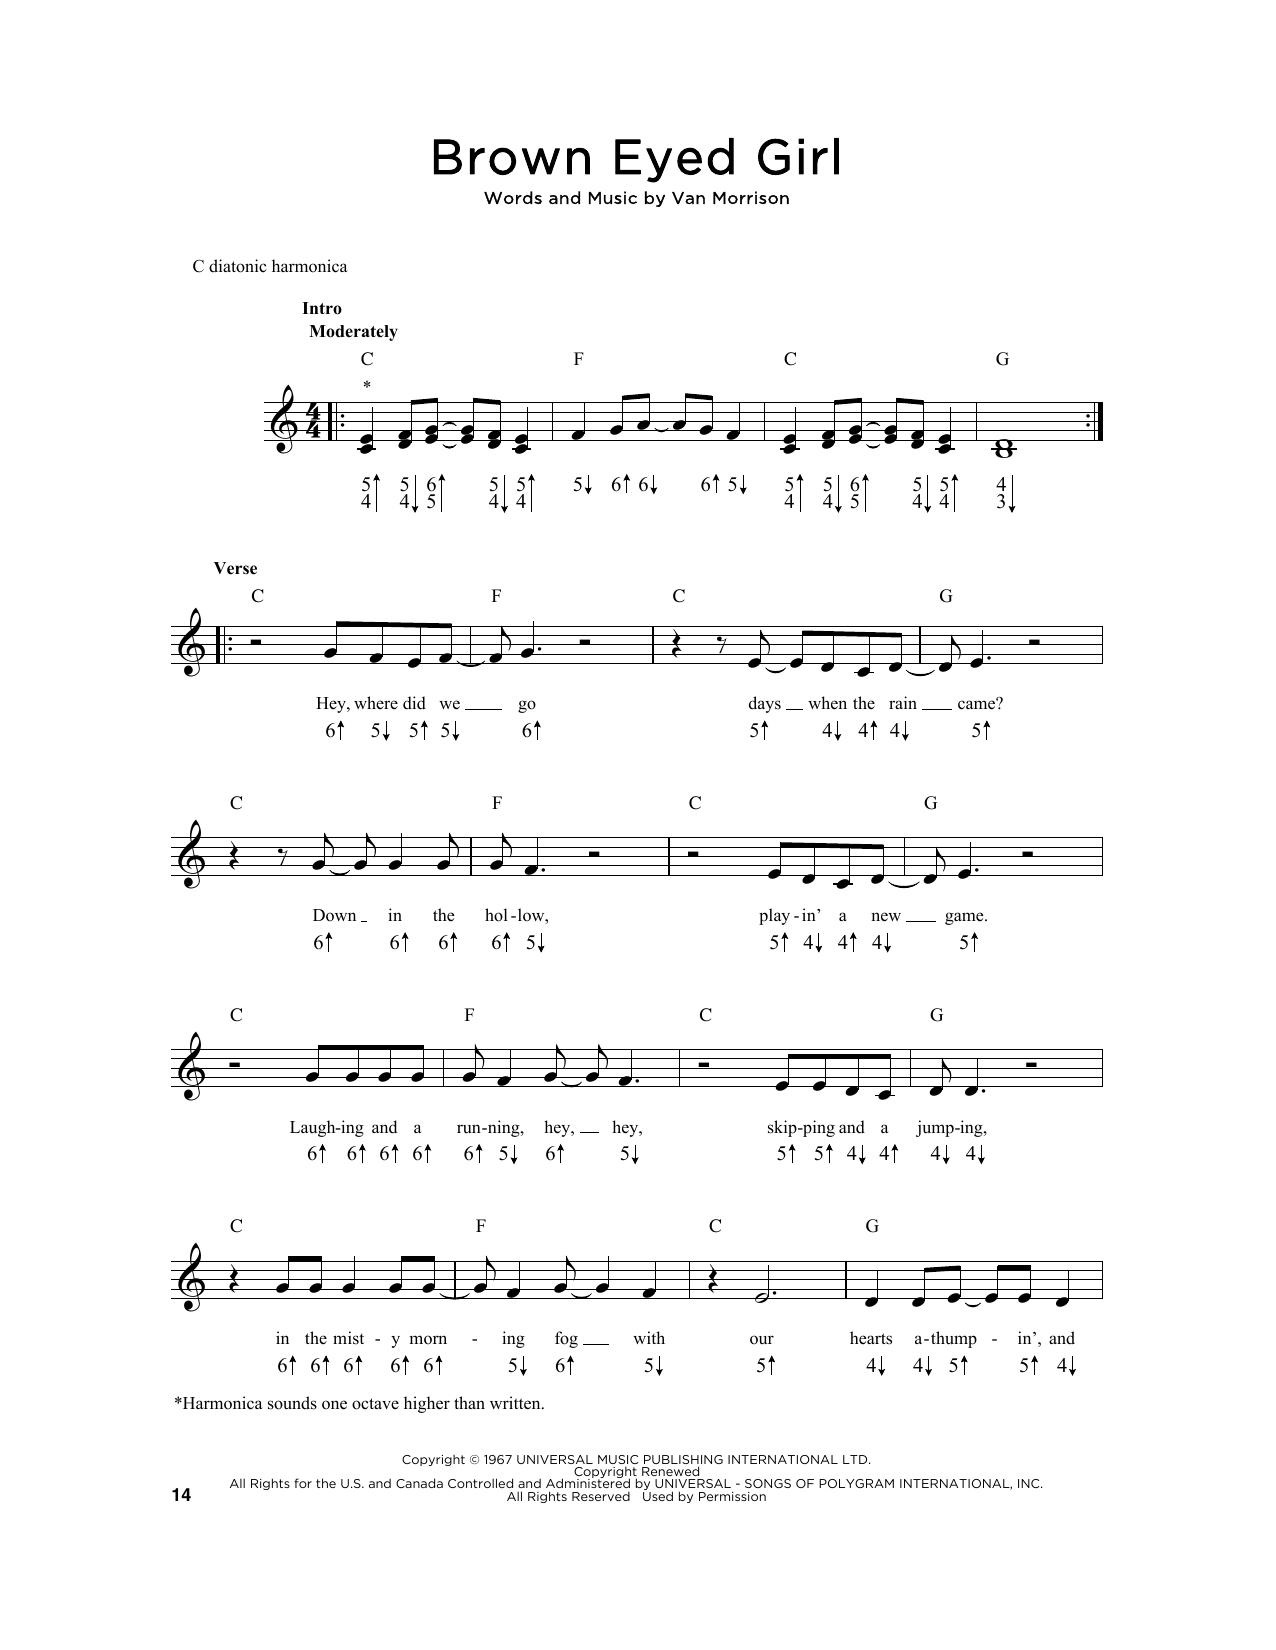 Brown Eyed Girl Chords Brown Eyed Girl Sheet Music Van Morrison Harmonica